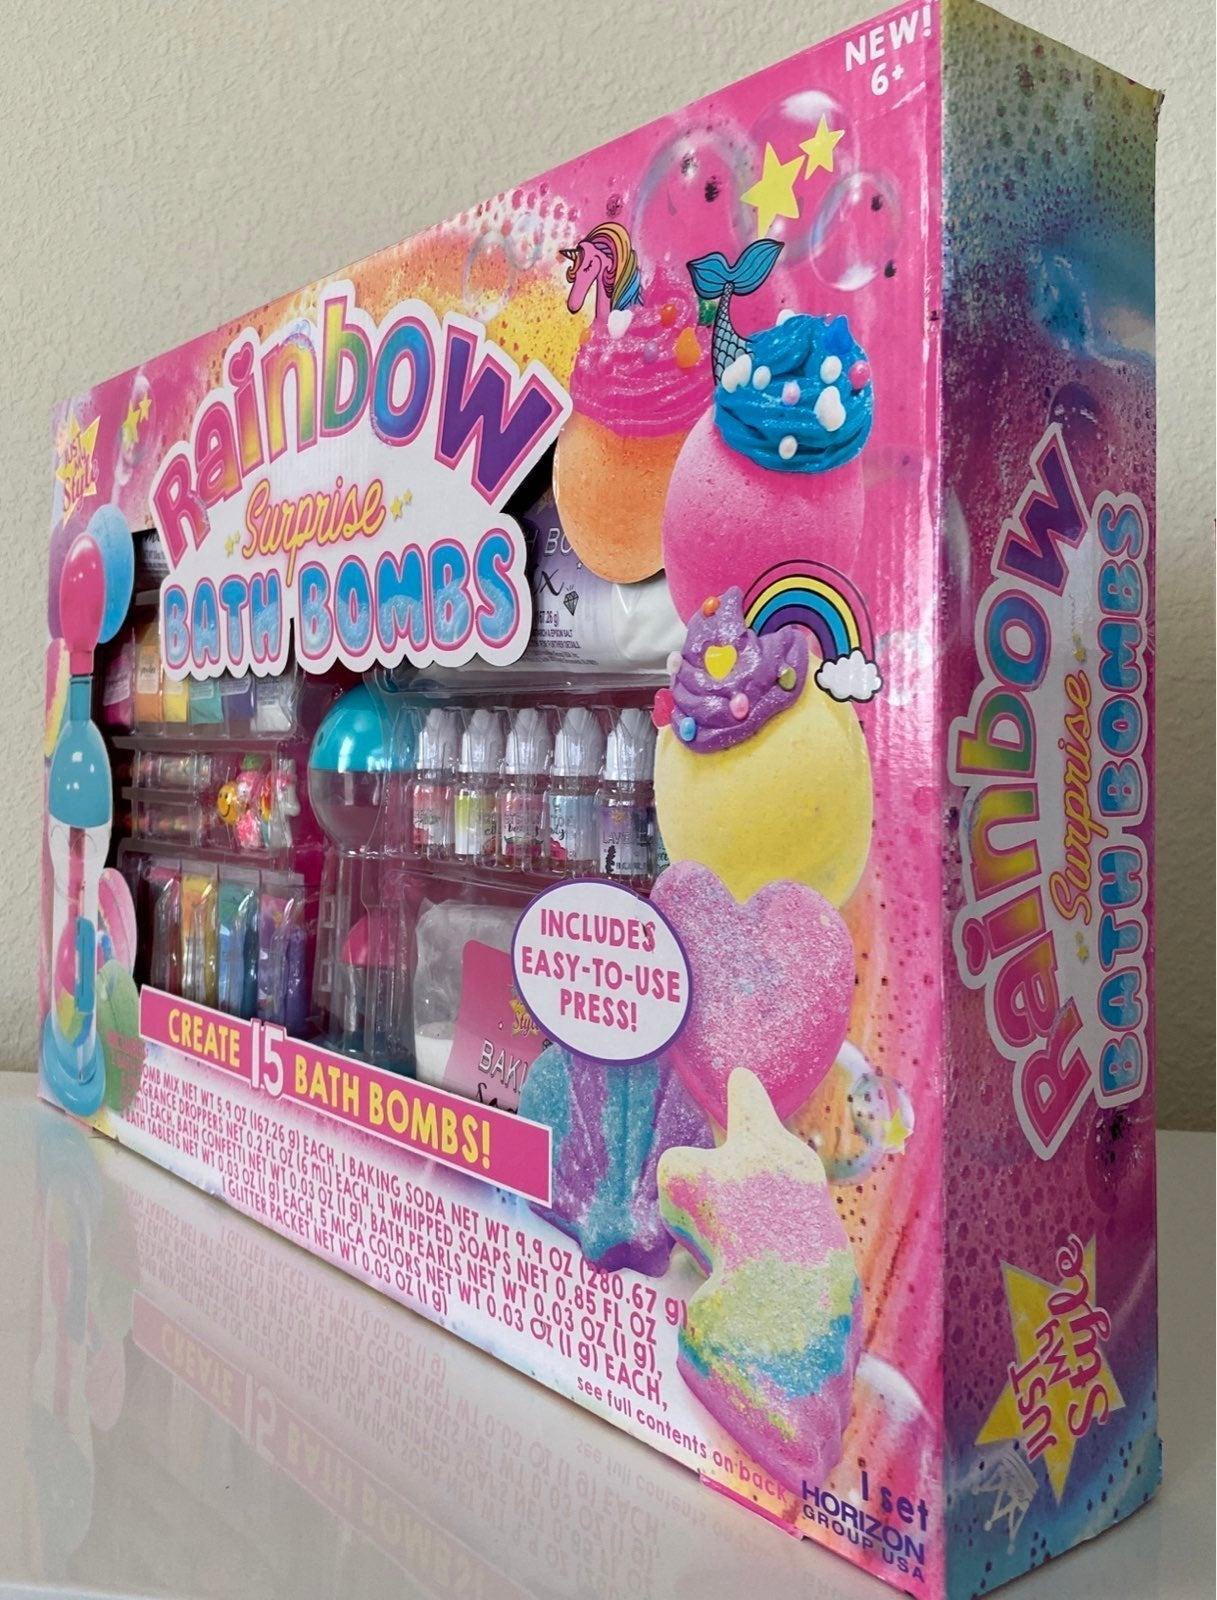 Rainbow Surpise Bath Bombs